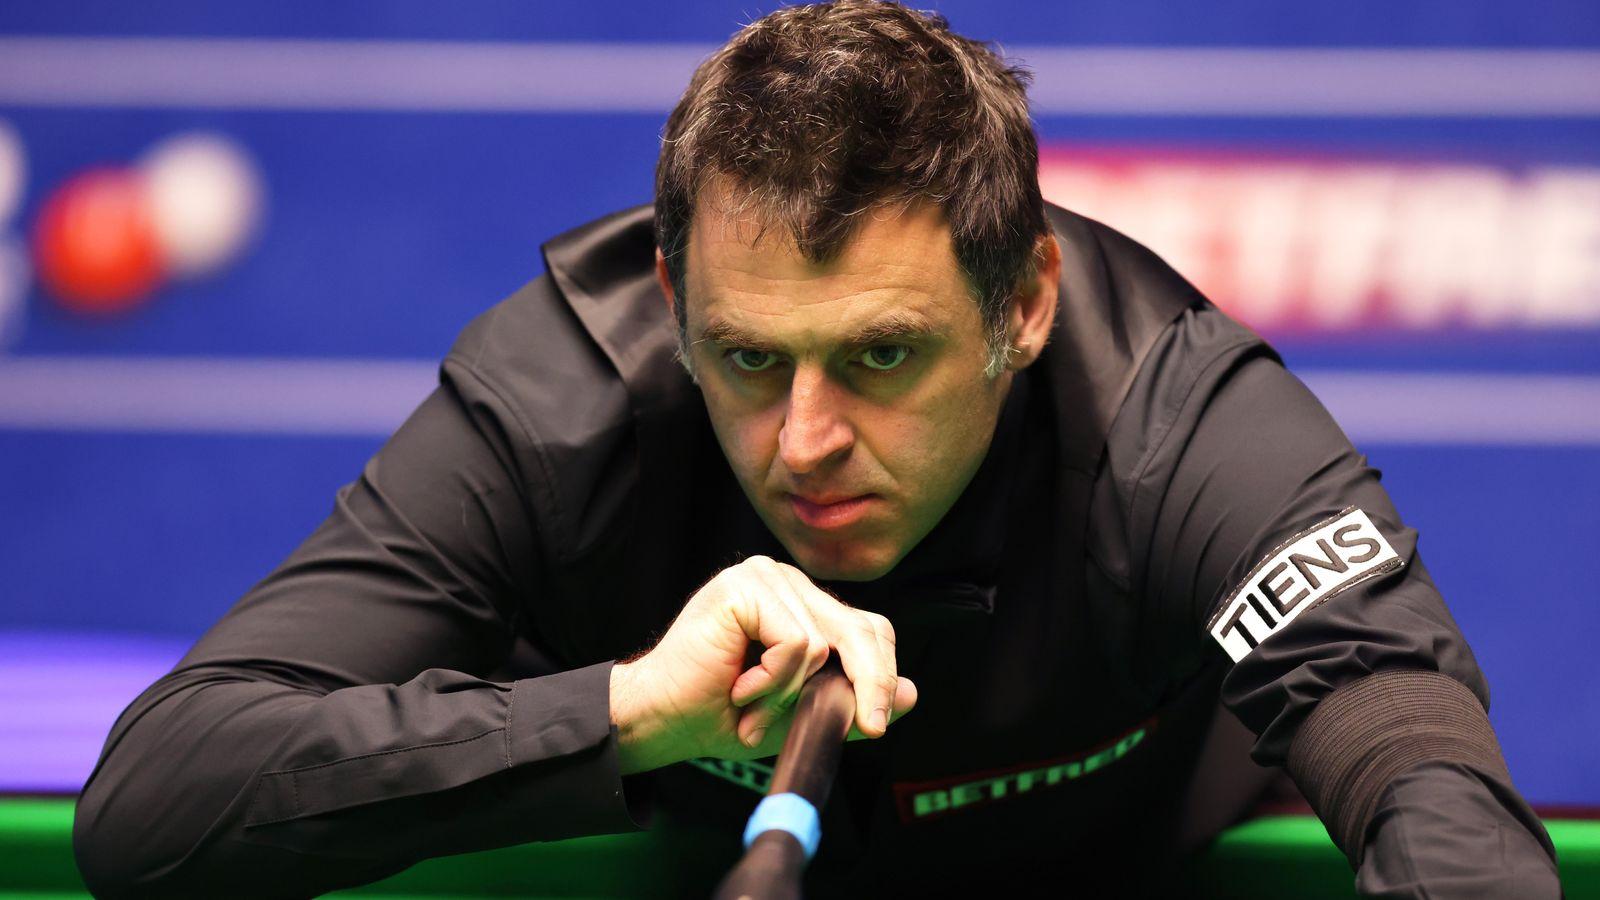 Ronnie O'Sullivan has overtaken Mark Joyce at the World Snooker Championships, Crucible |  Snooker News